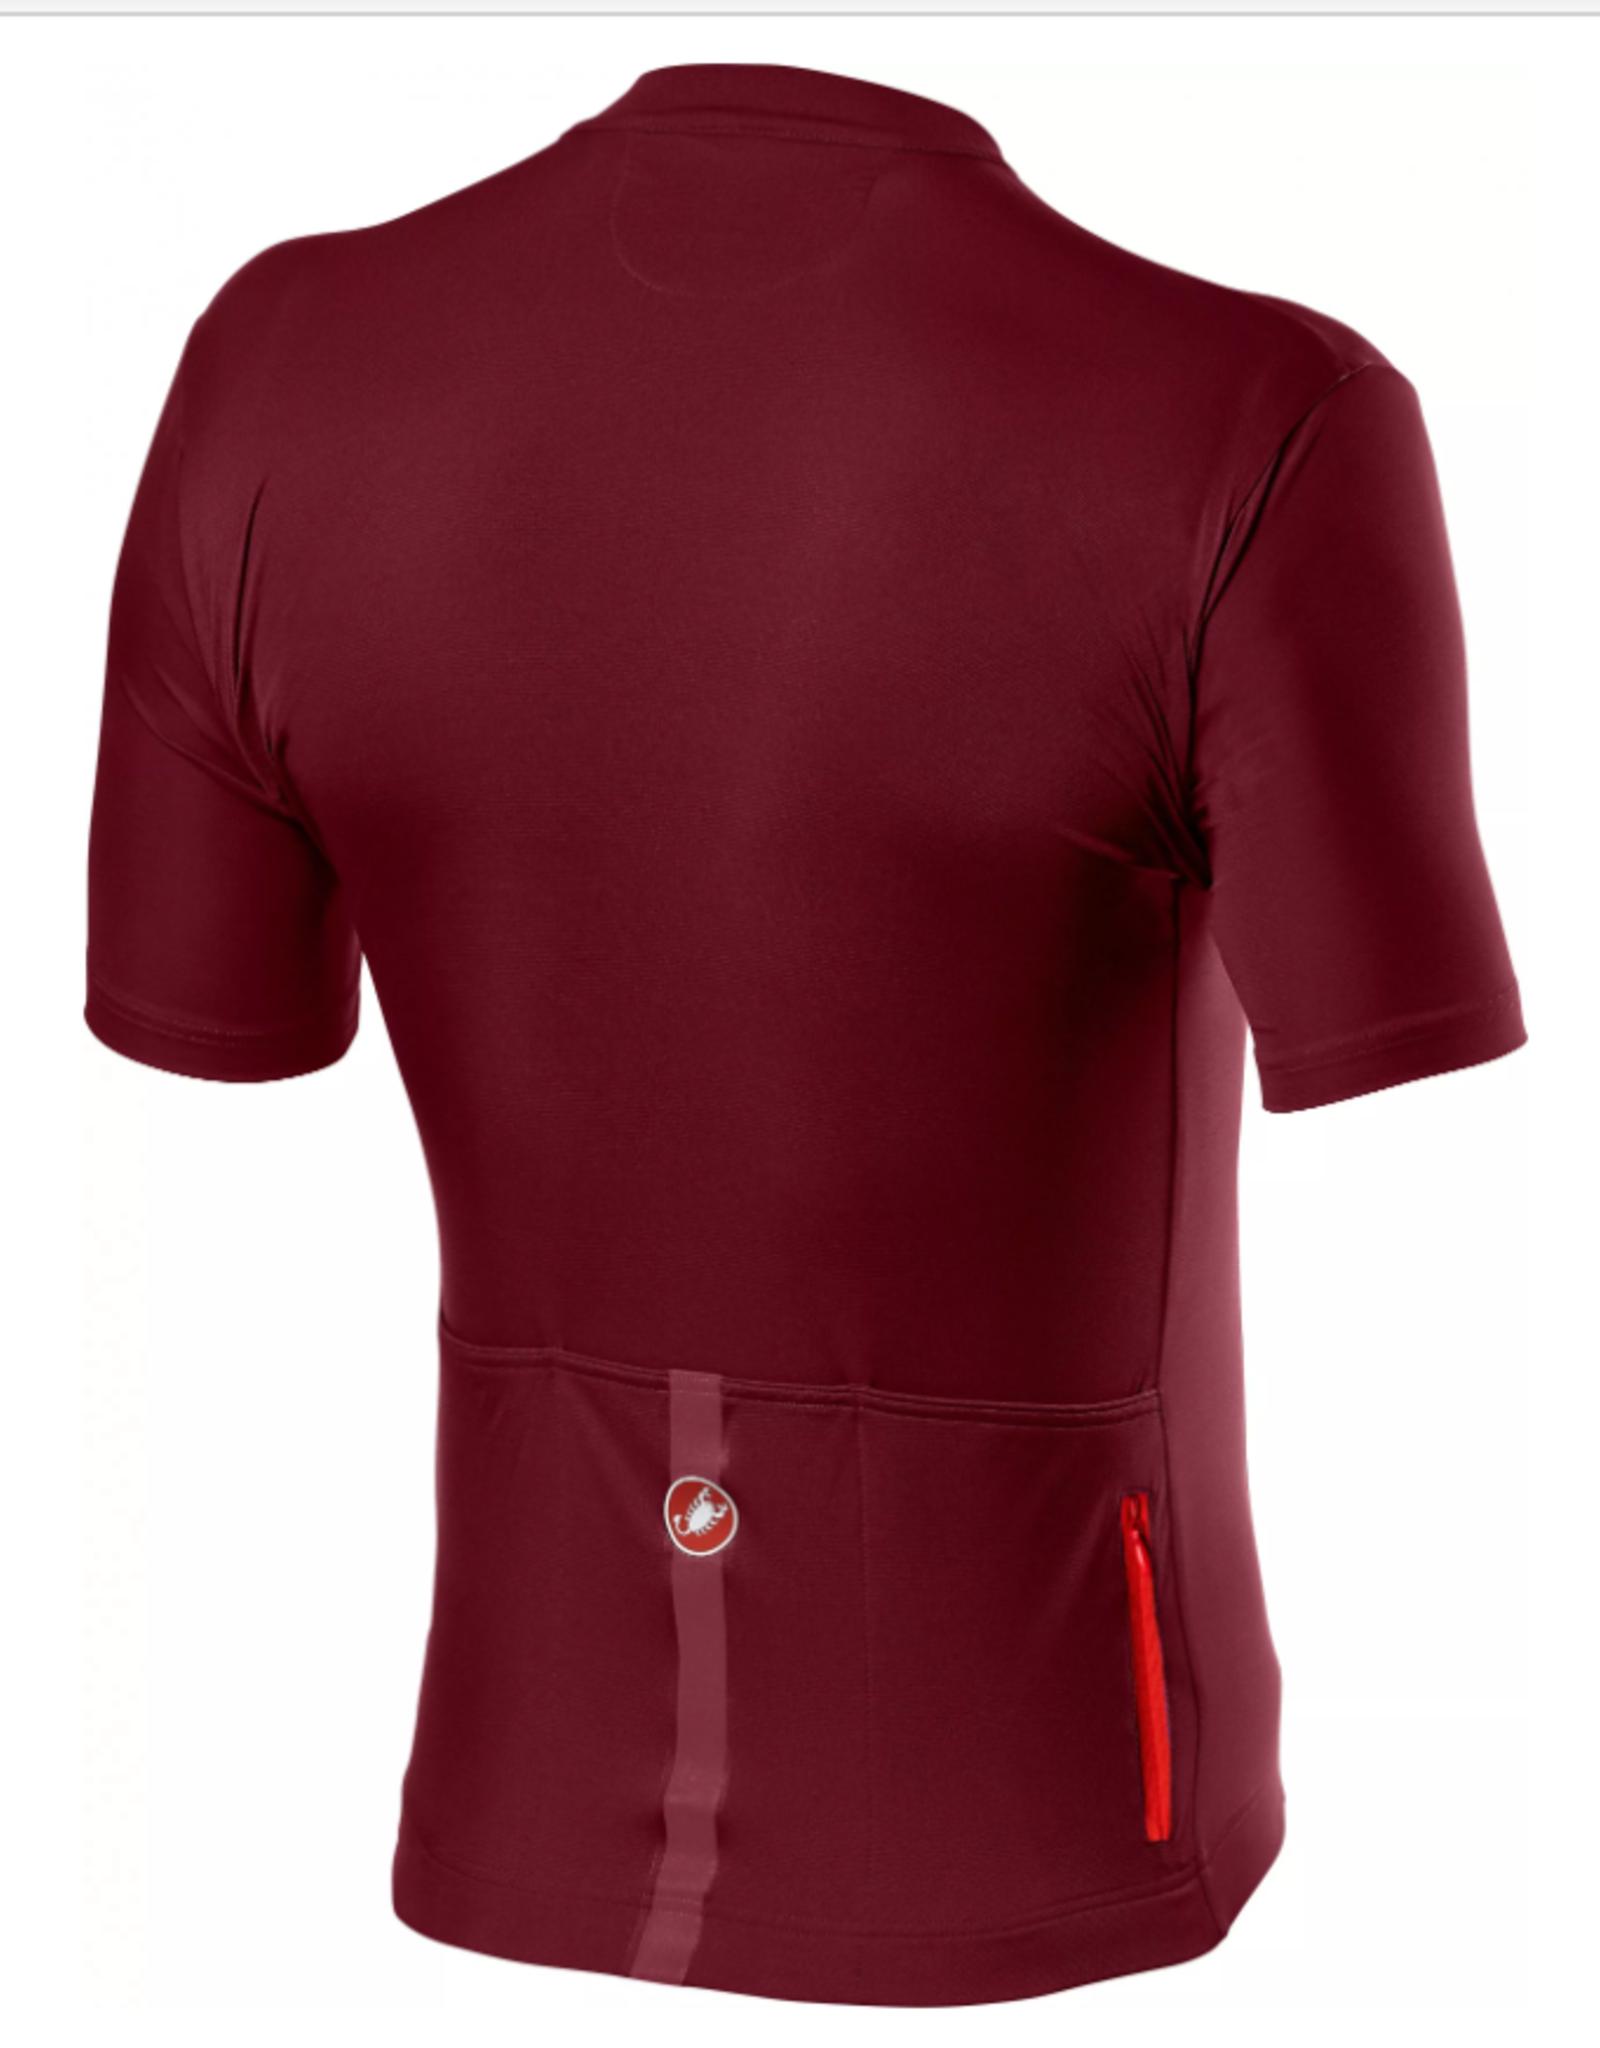 castelli Classifica jersey (4521021)